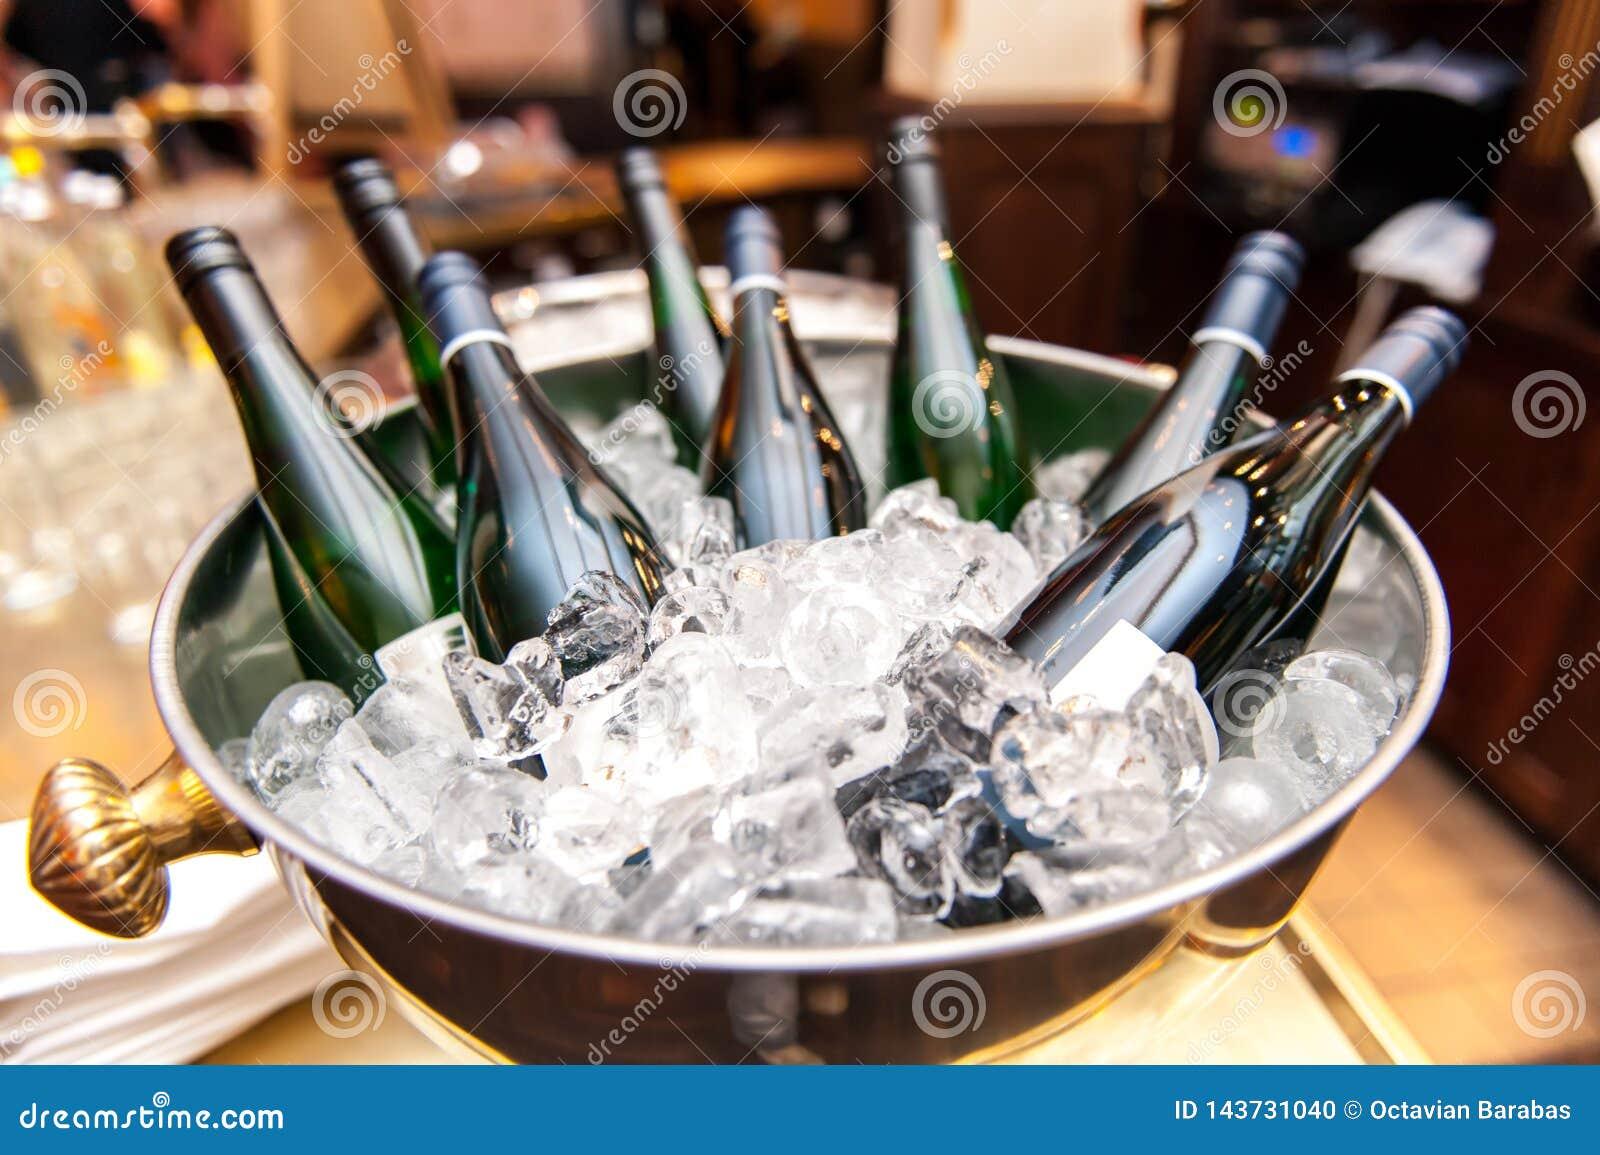 Бутылки белого вина в шаре льда